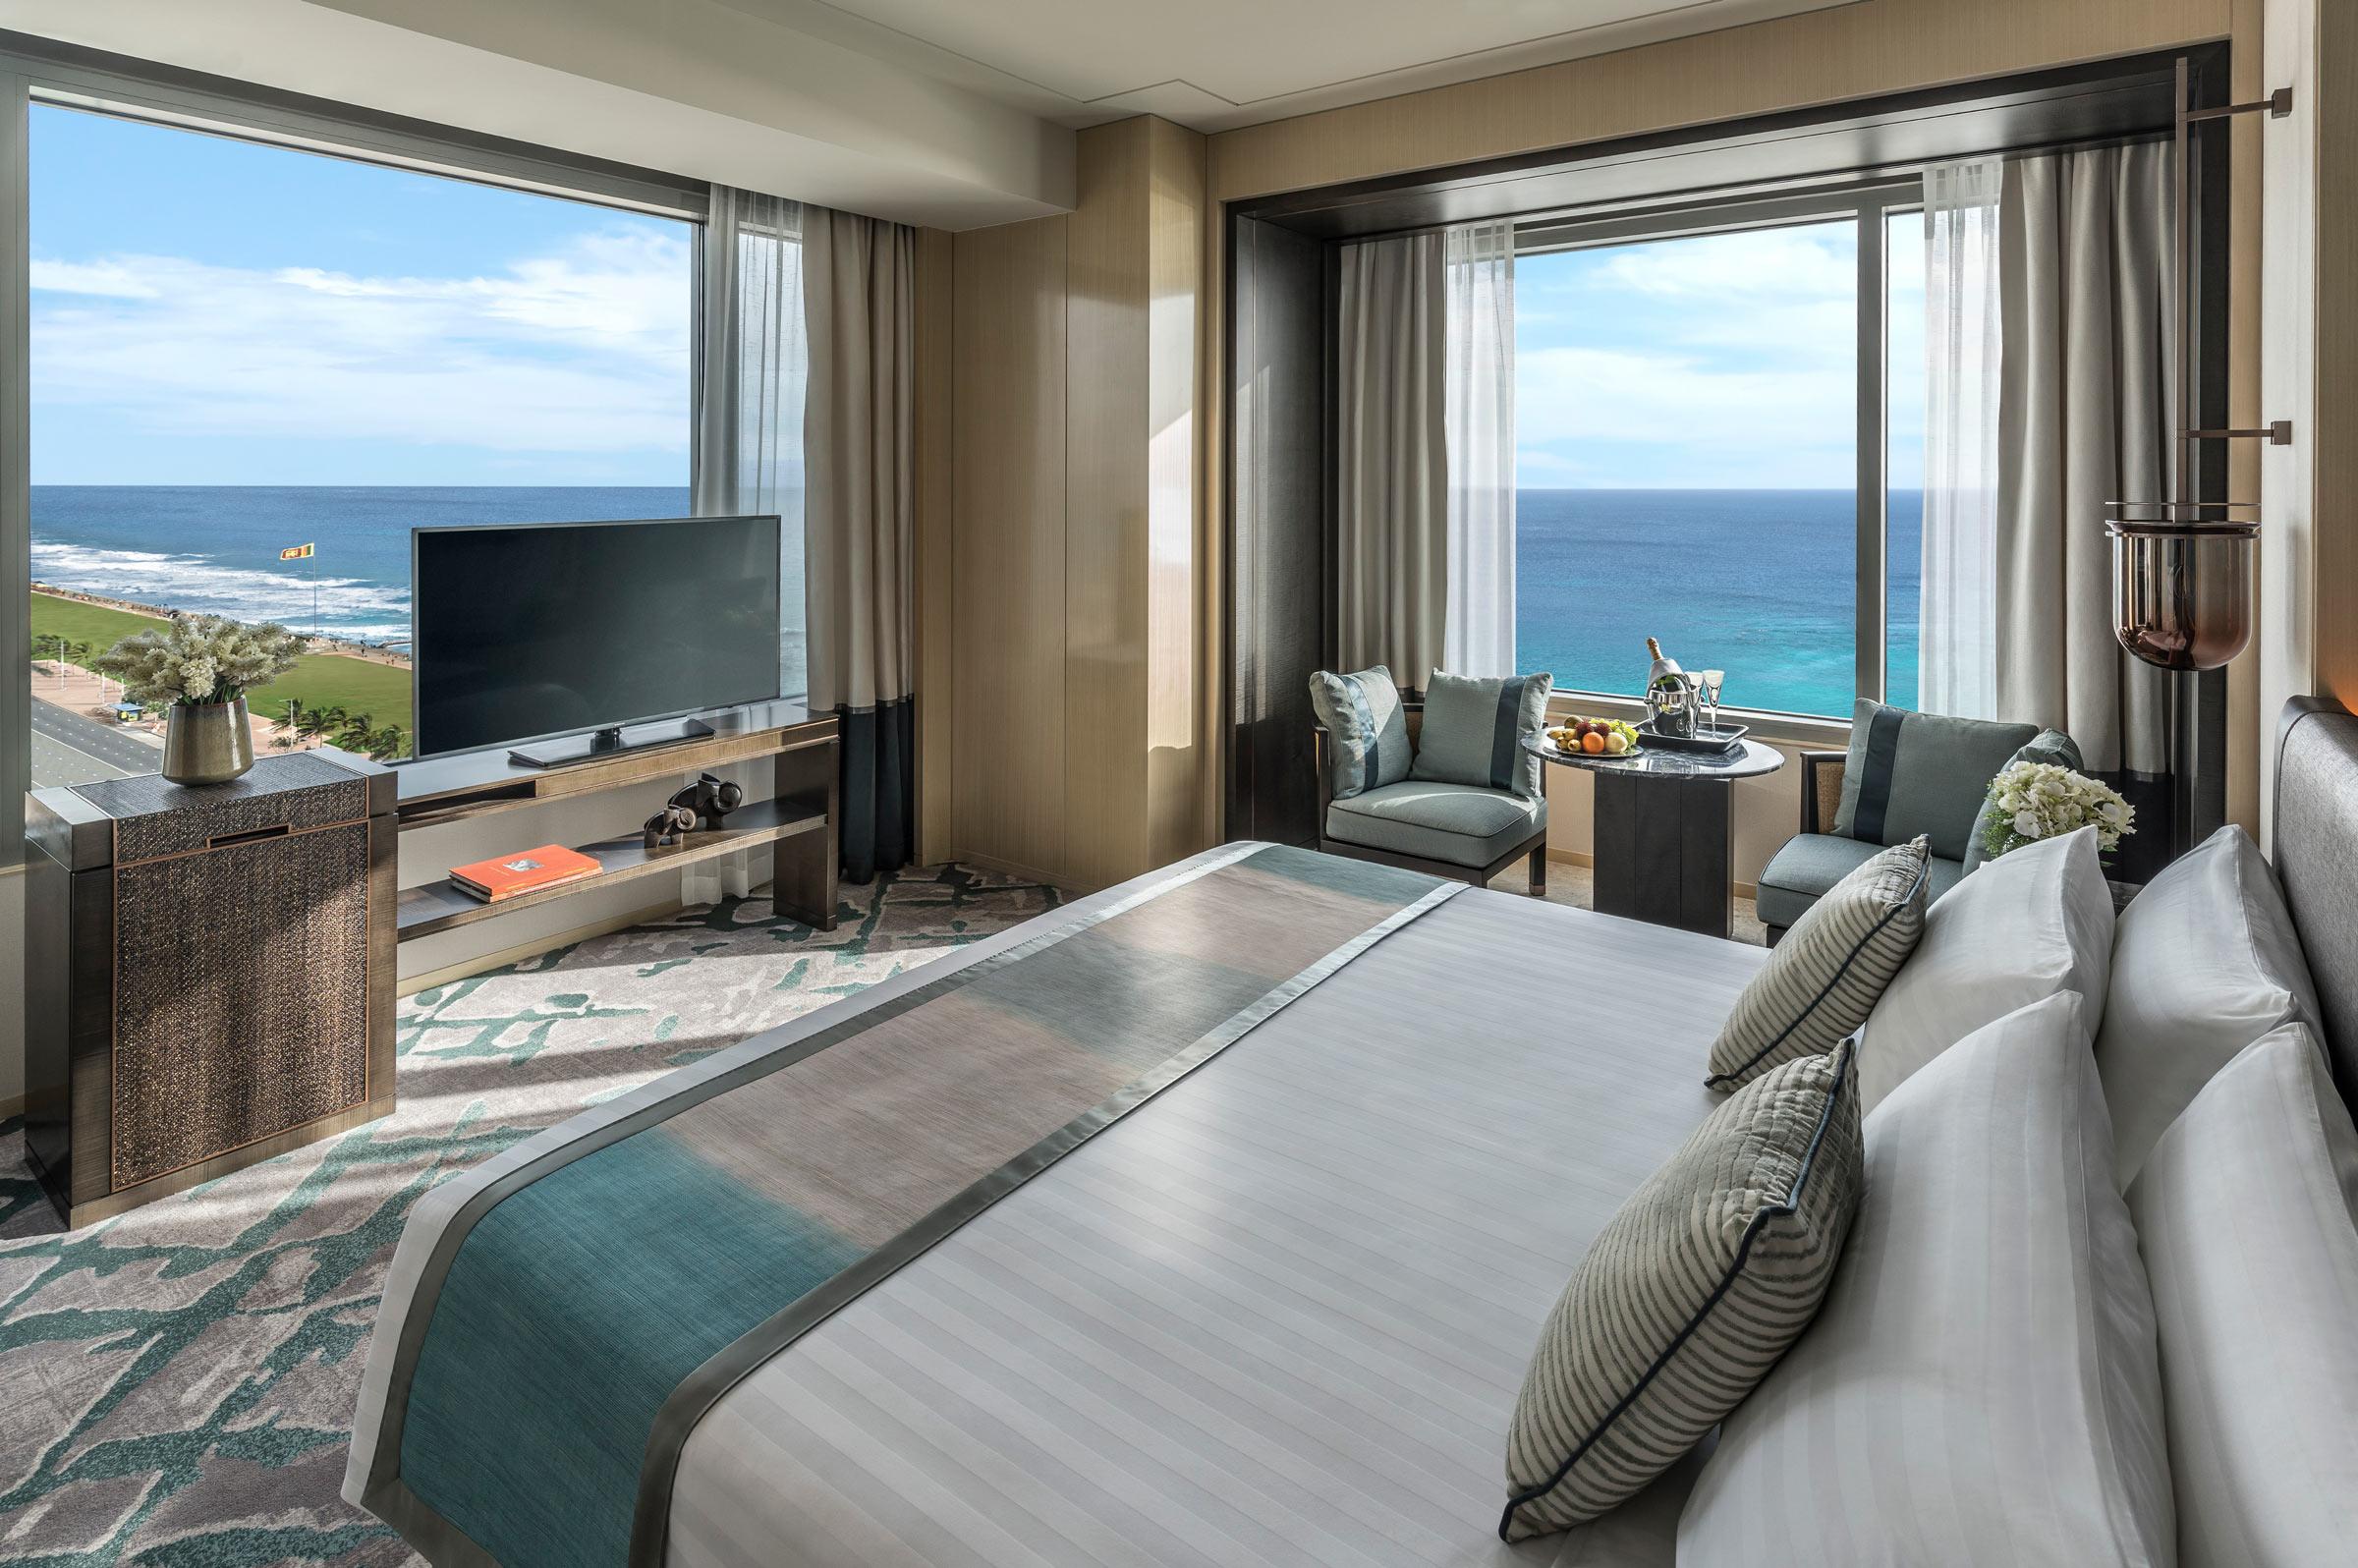 LTW_Shangri-La_Colombo_Horizon_Club_Ocean_View_Room-(Credit-Shangri-La-Colombo).jpg